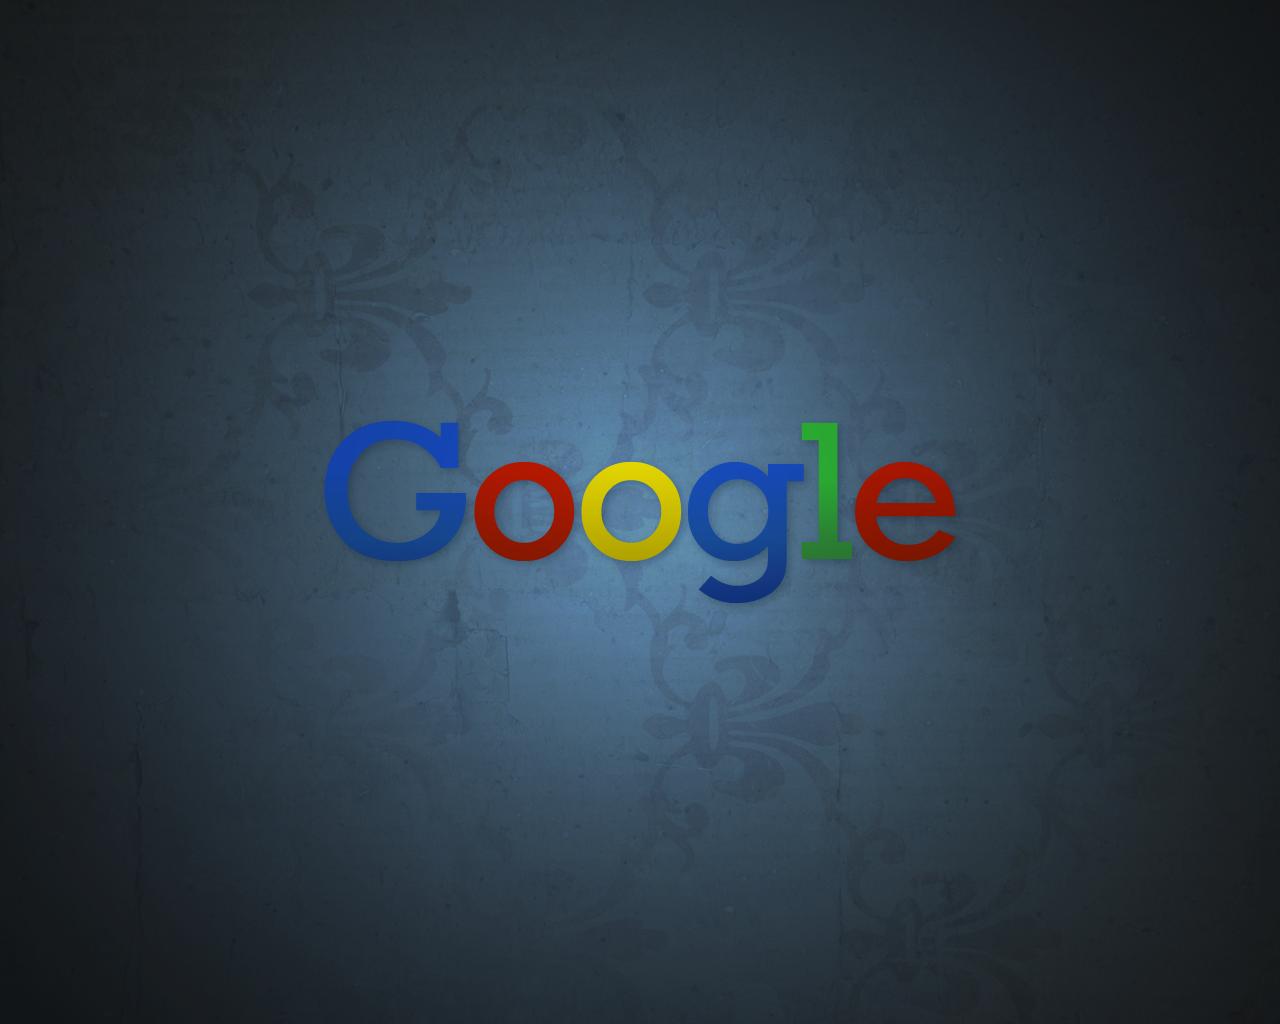 google wallpapers hd google desktop wallpapers google desktop 1280x1024